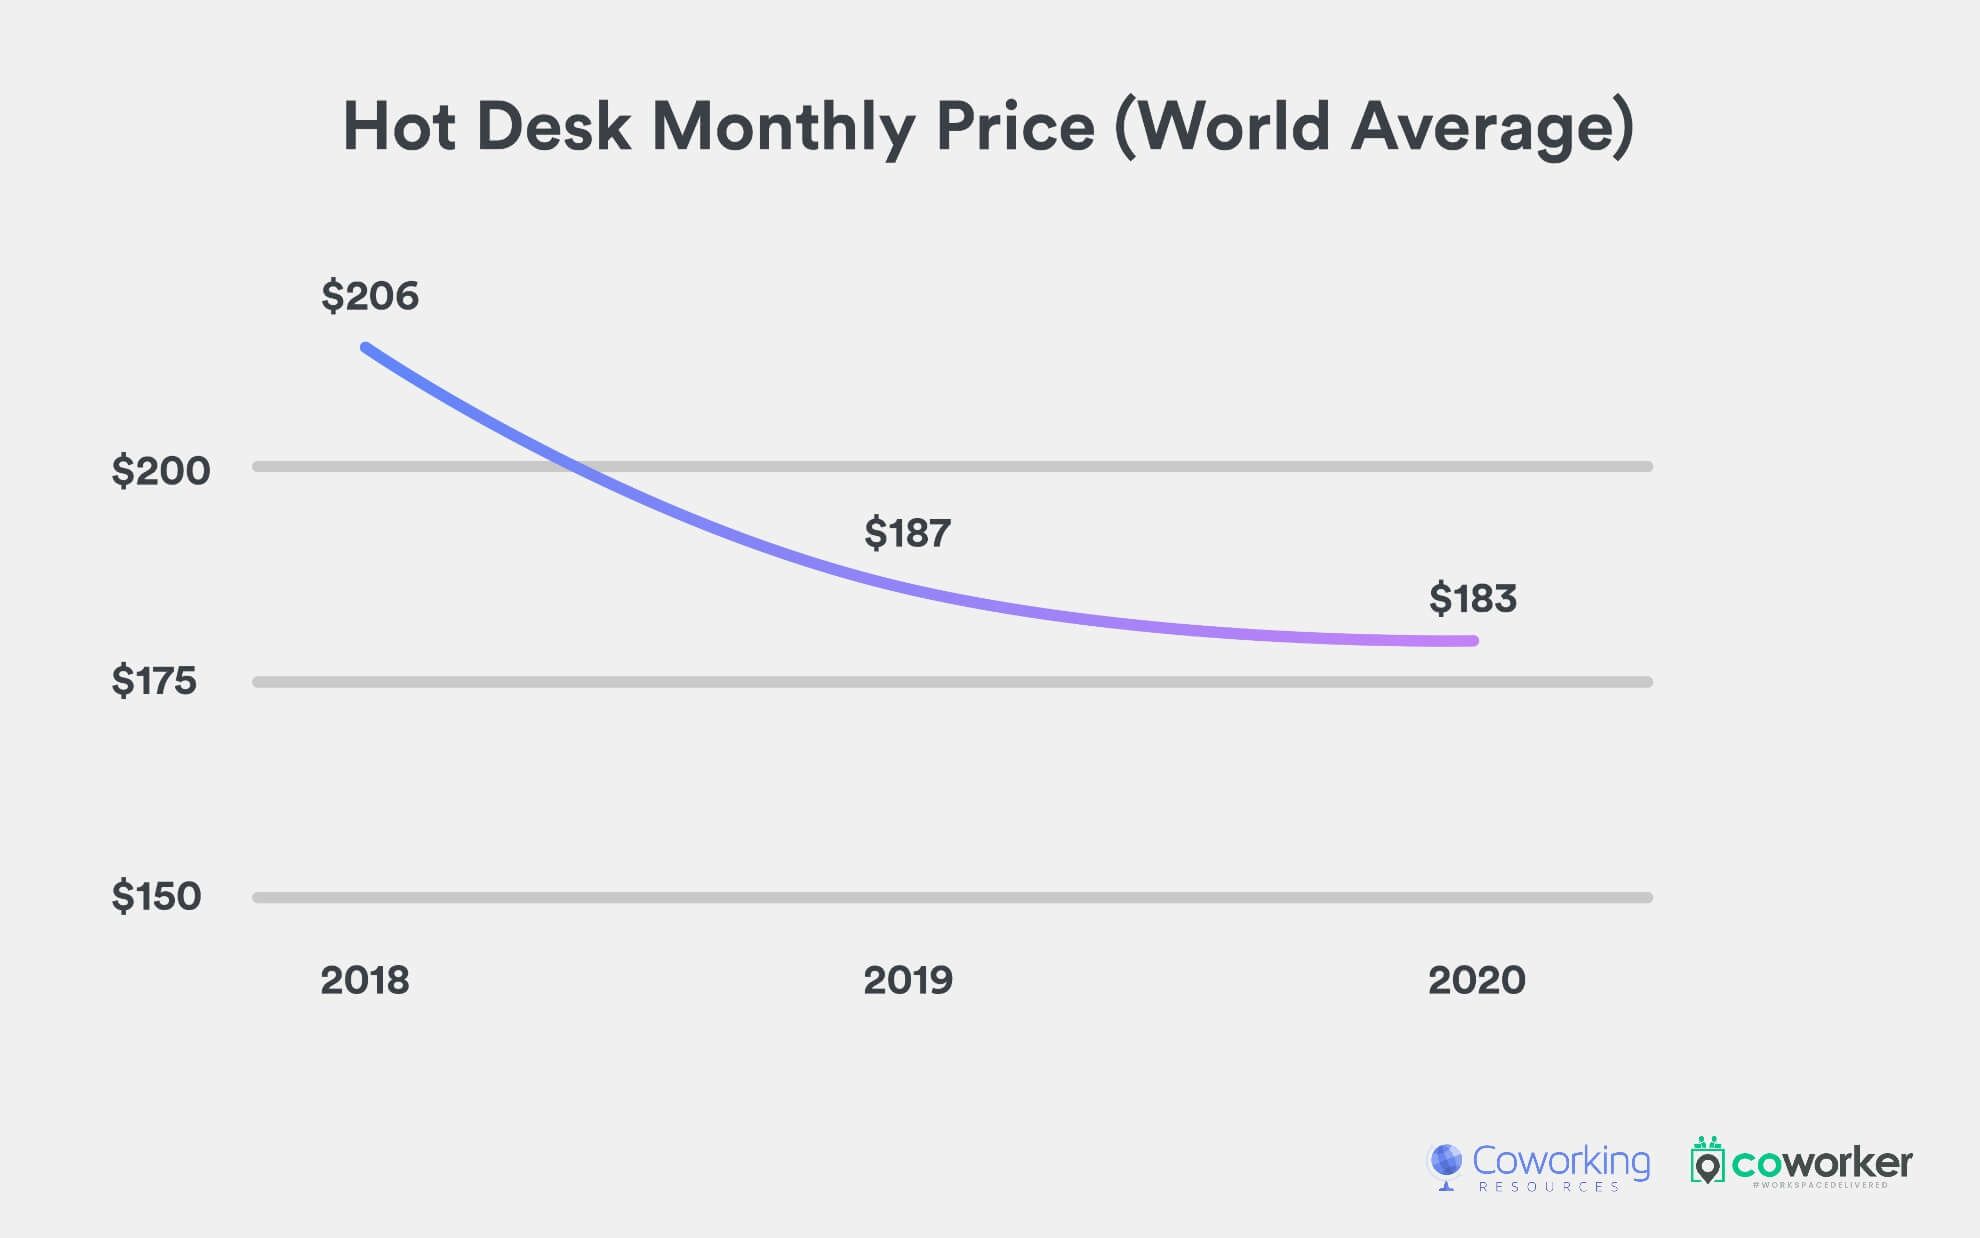 Hot Desk Price (World Average, 2018-2020)